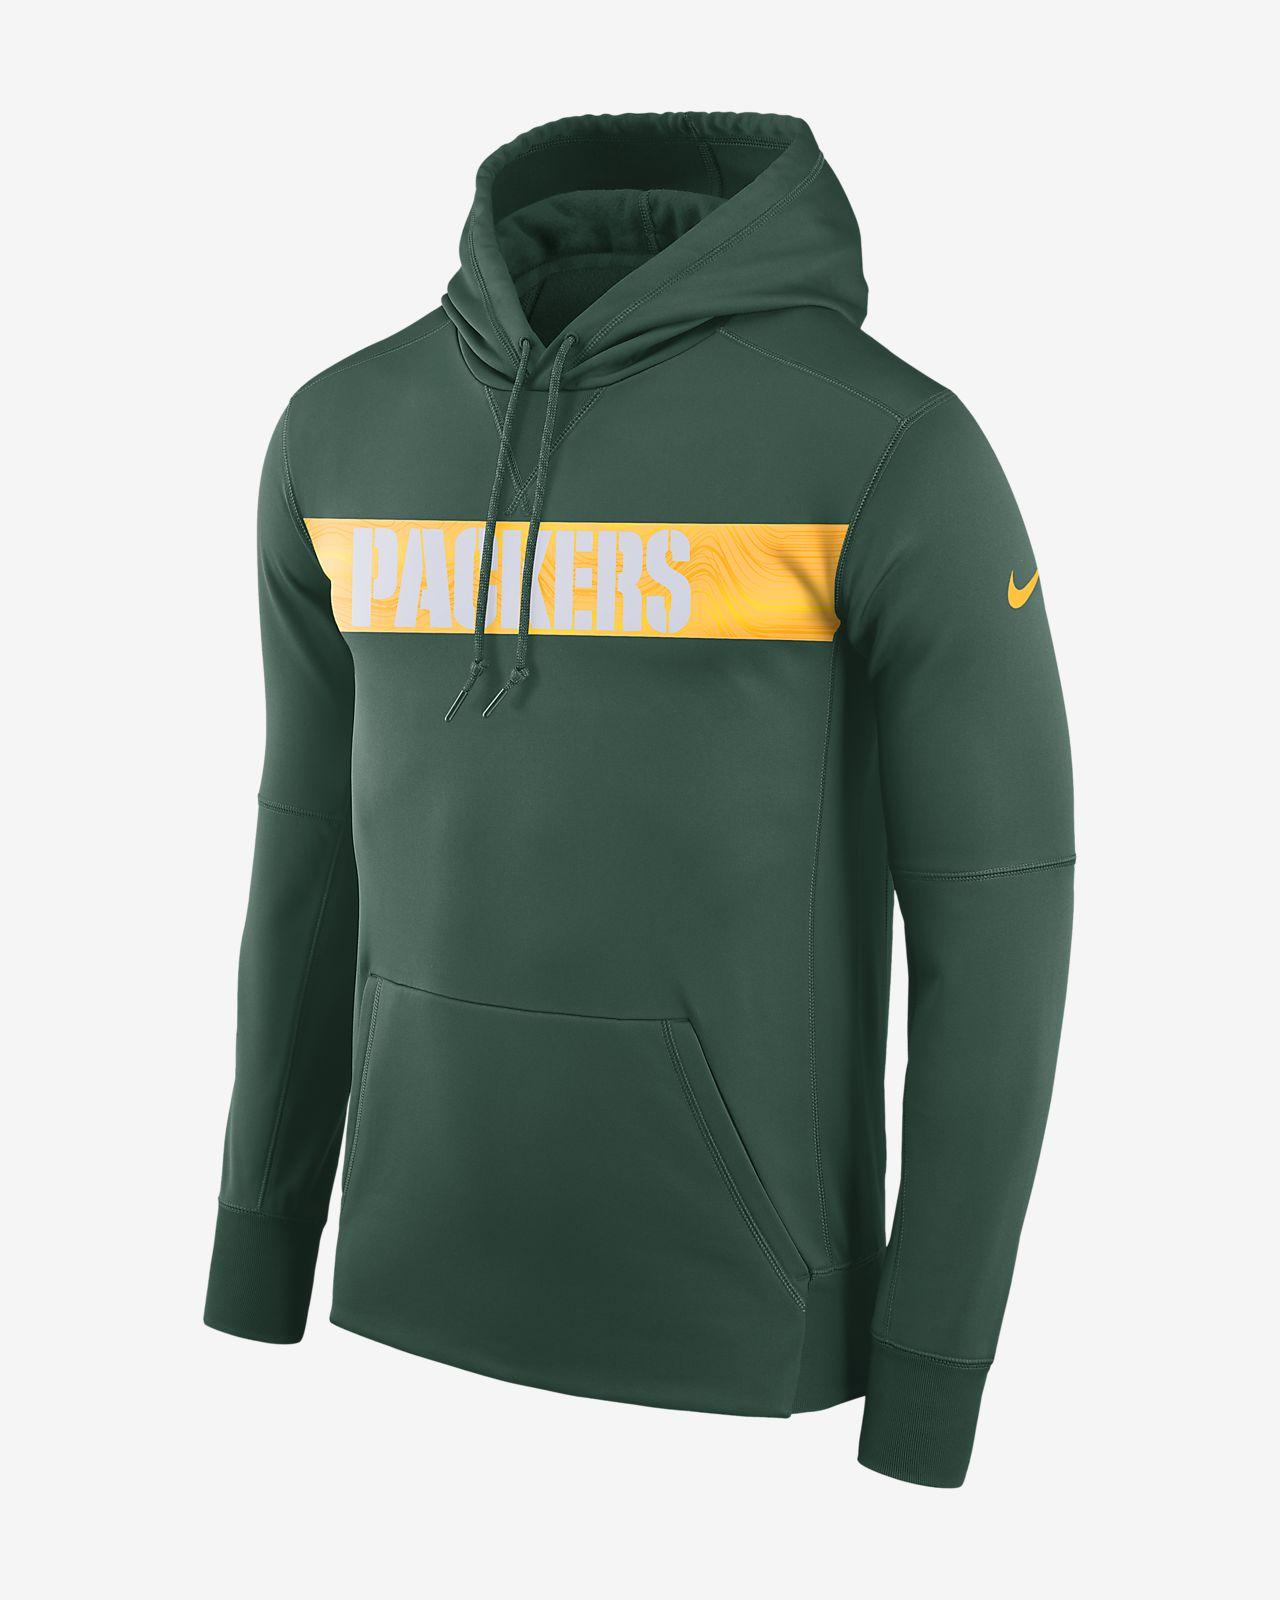 Hoodie pullover Nike Dri-FIT Therma (NFL Packers) para homem